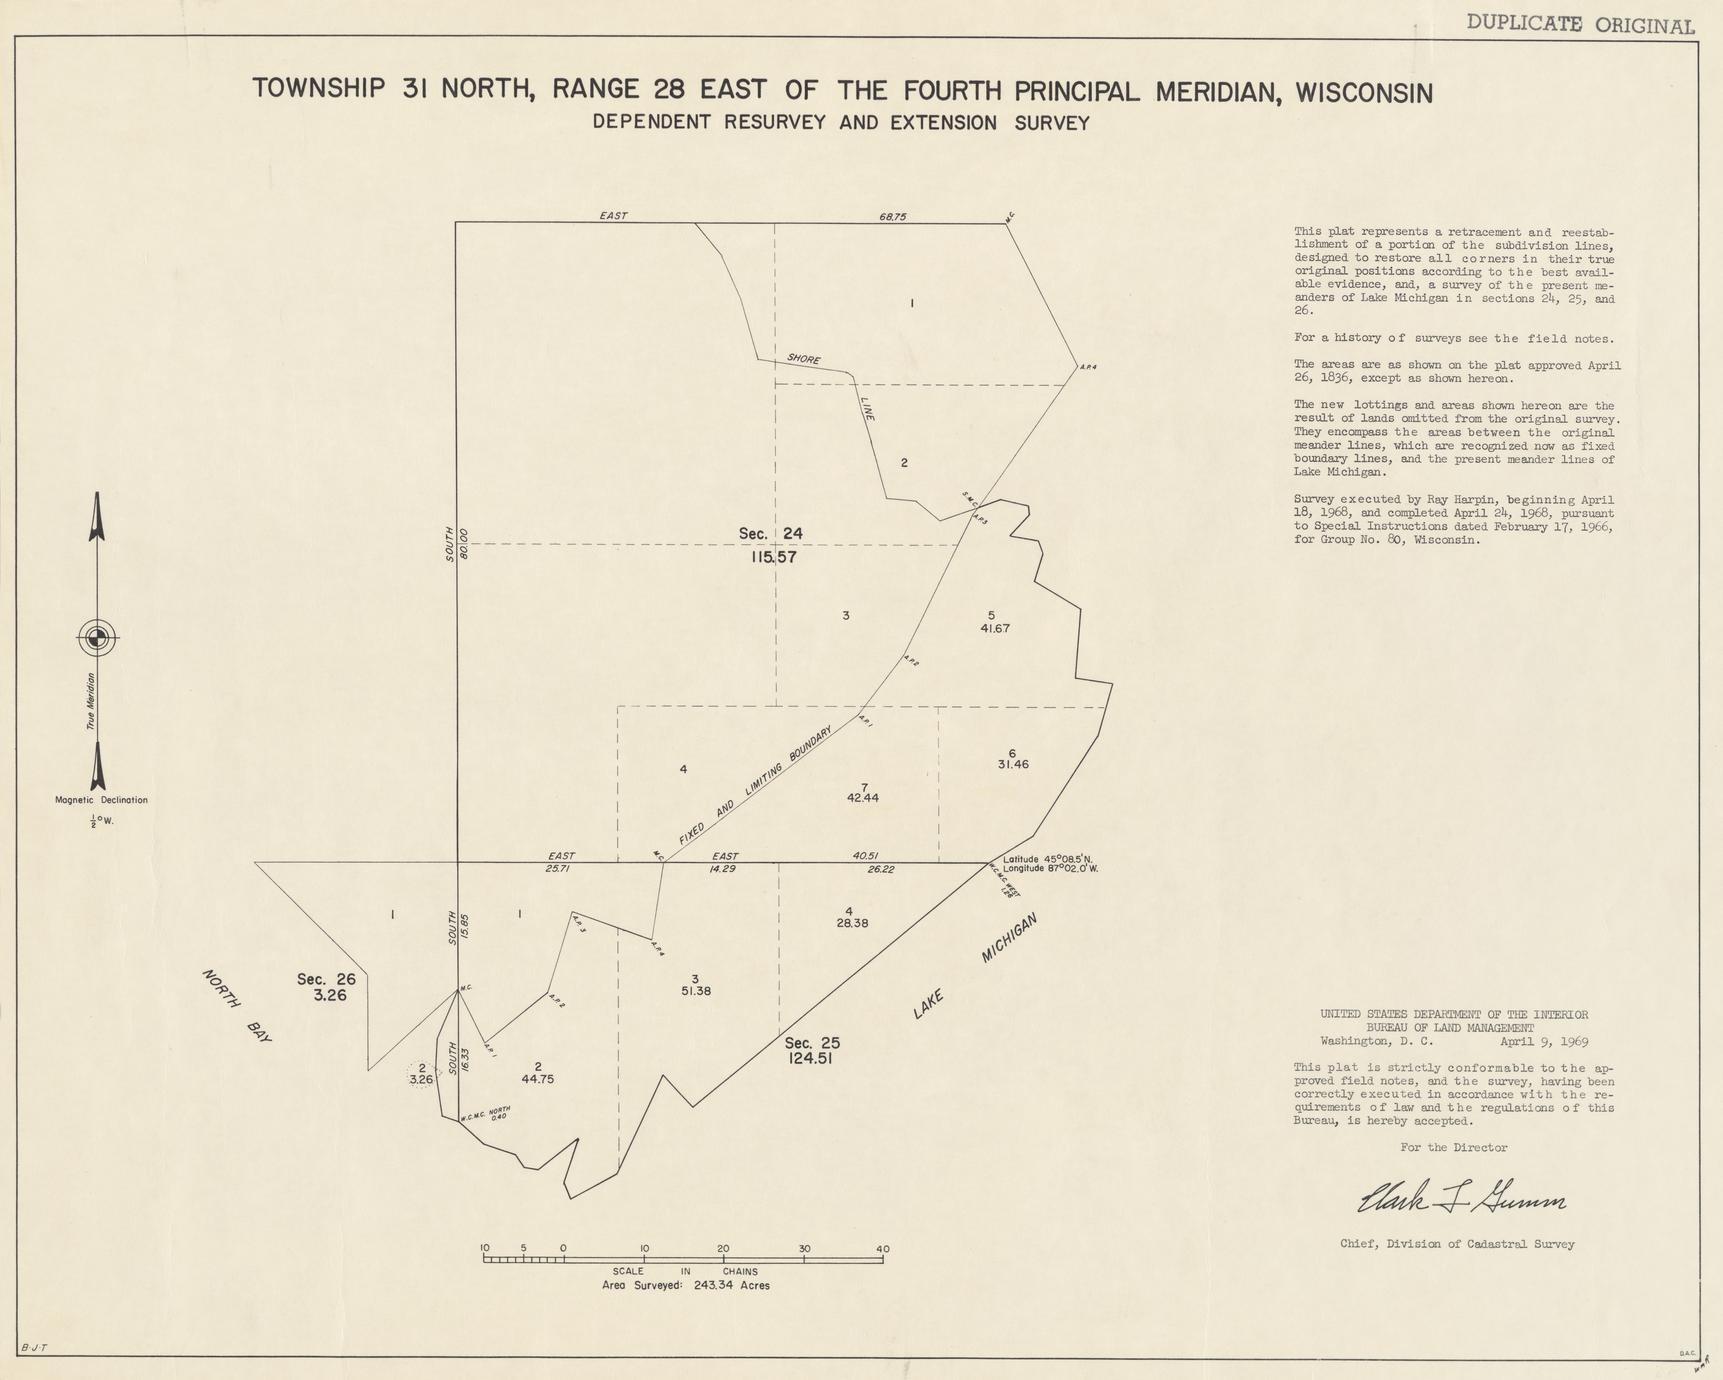 [Public Land Survey System map: Wisconsin Township 31 North, Range 28 East]